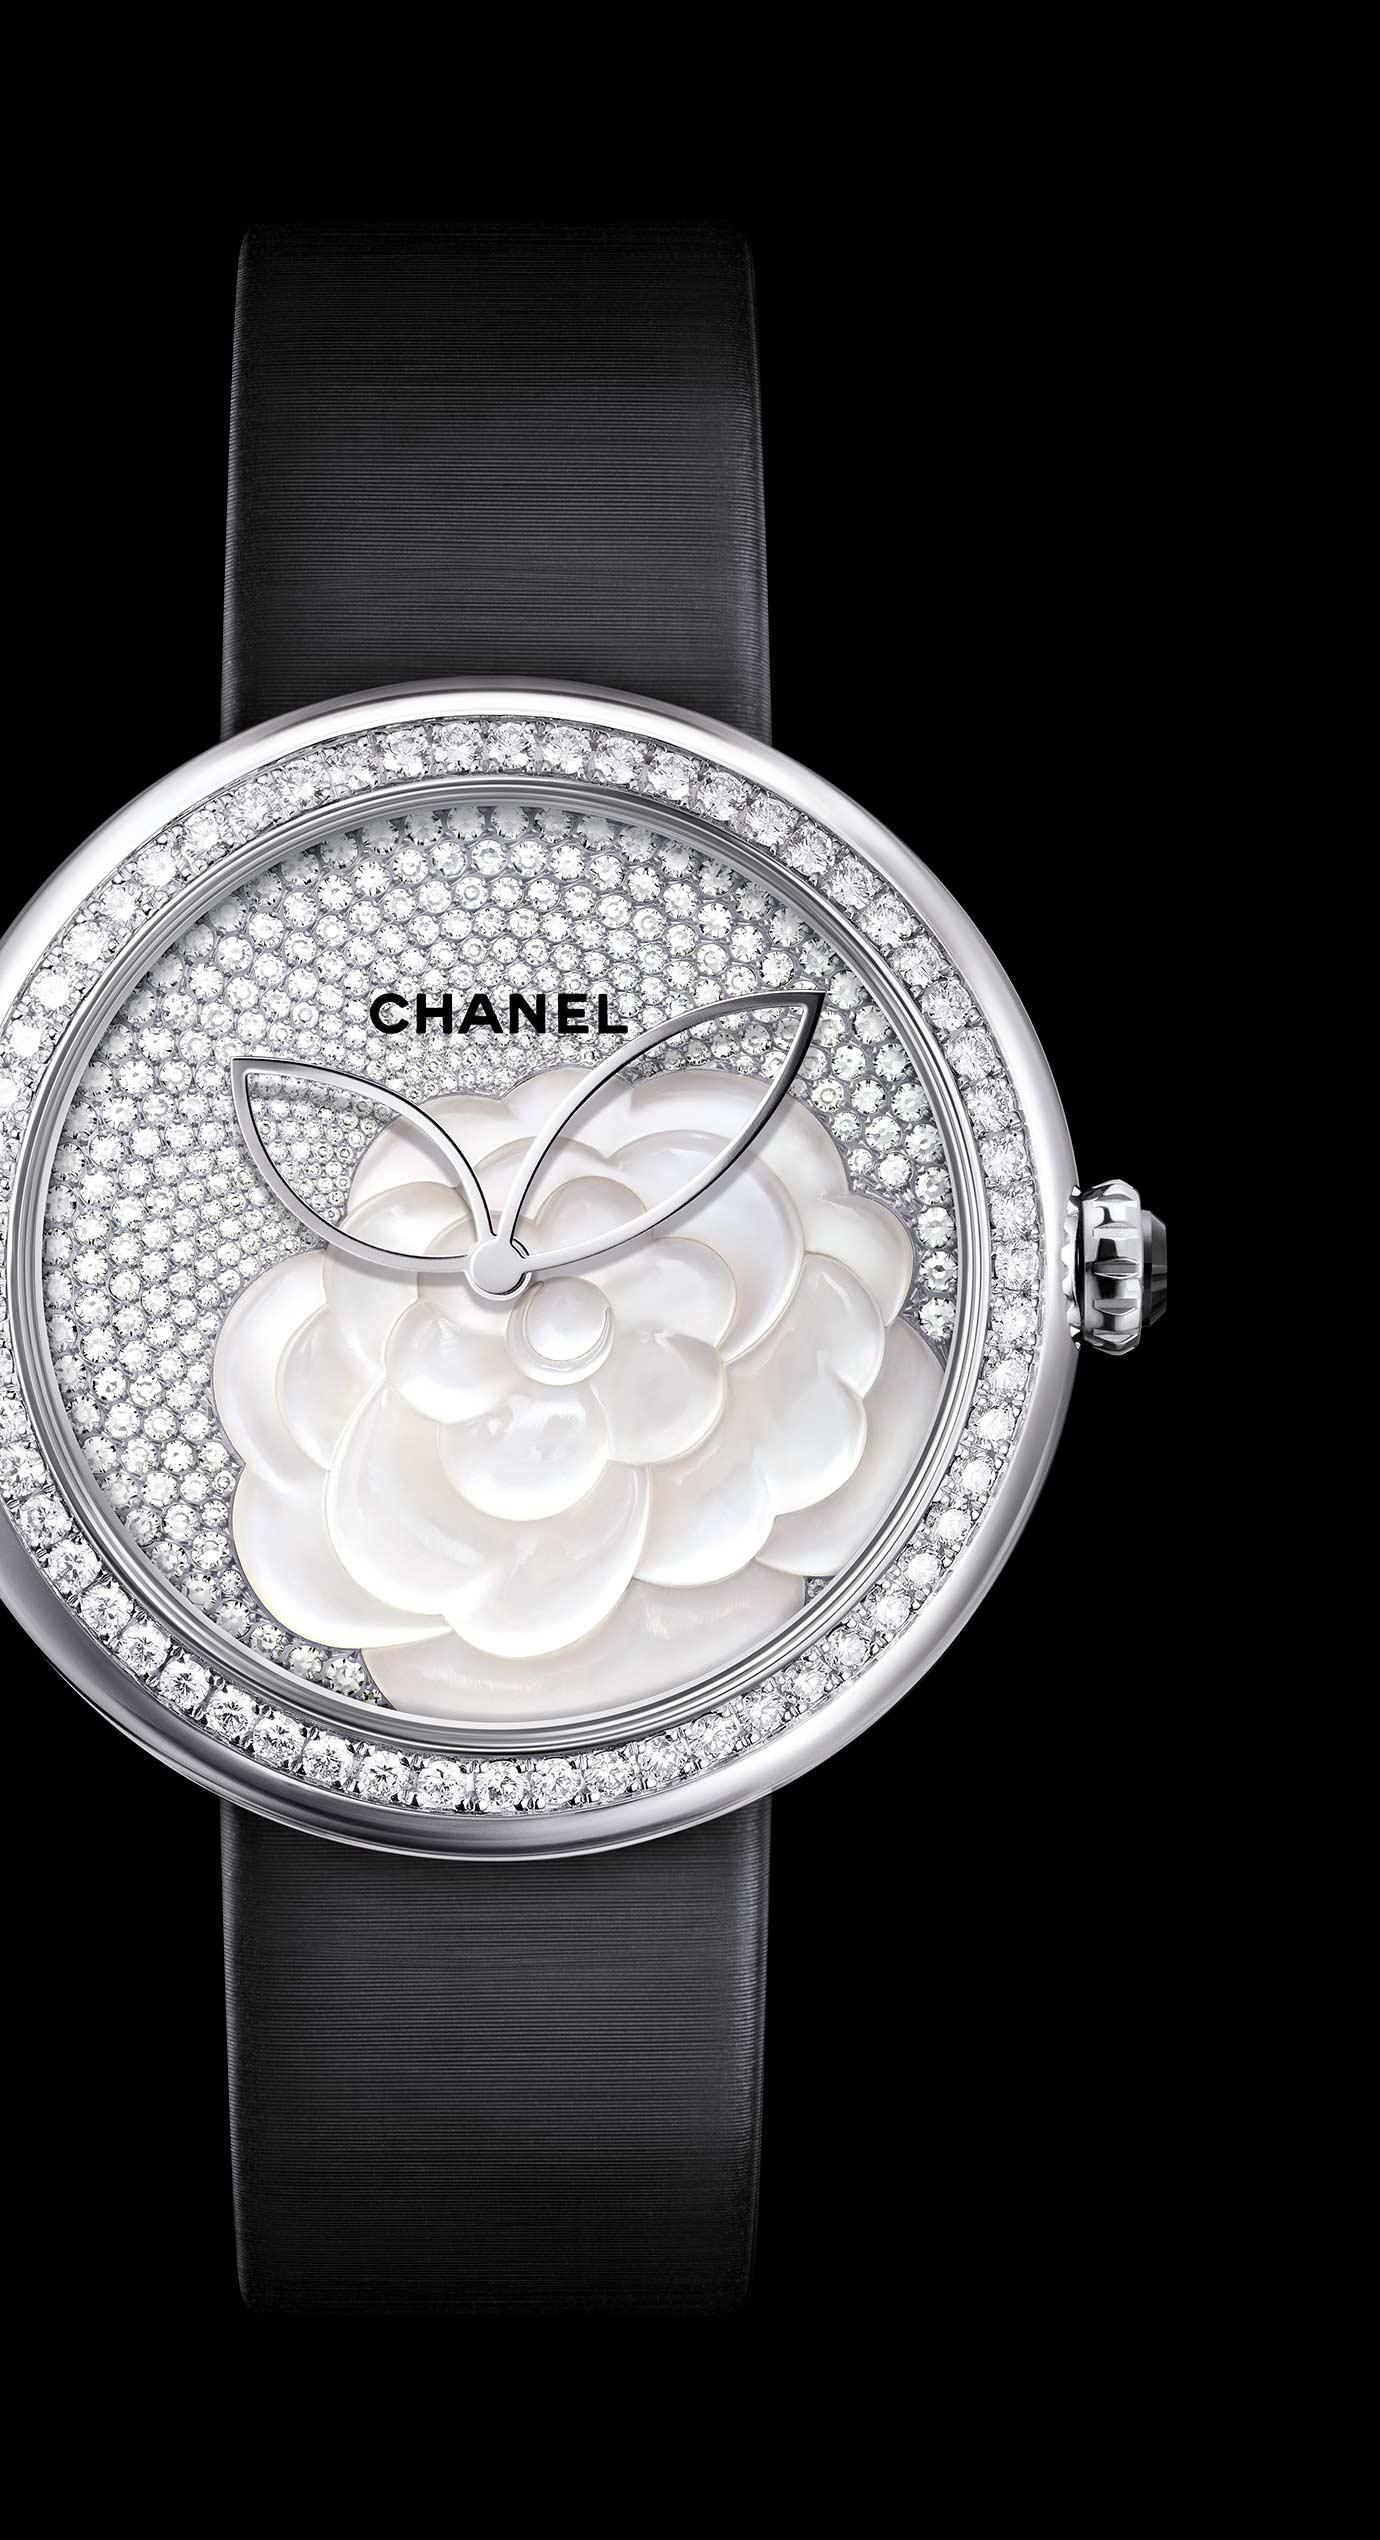 Reloj Mademoiselle Privé Camélia en marquetería en nácar, esfera engastada con diamantes - Vista ampliada